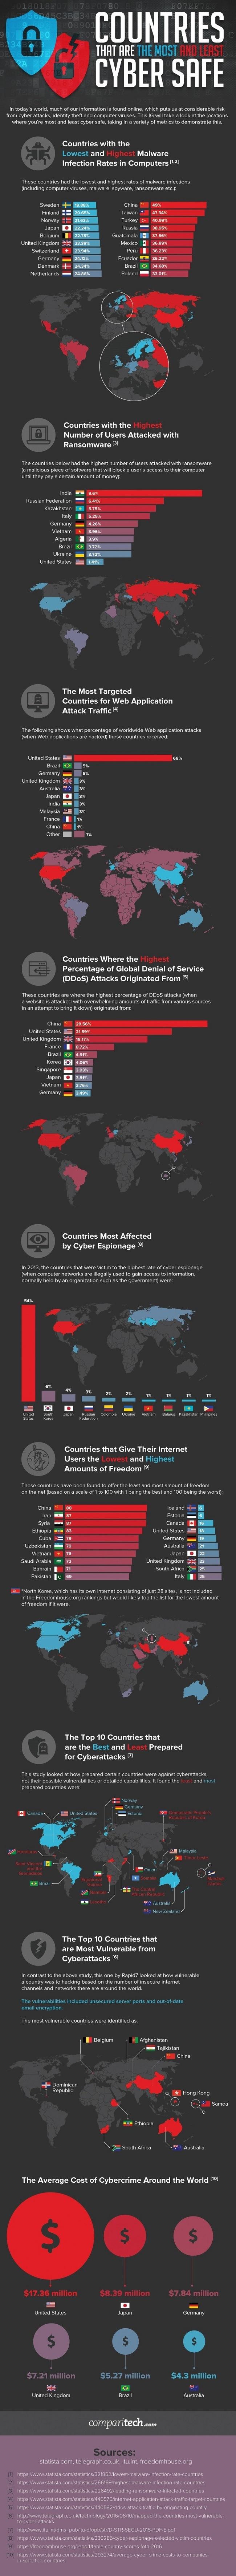 Cyberattacks infographic